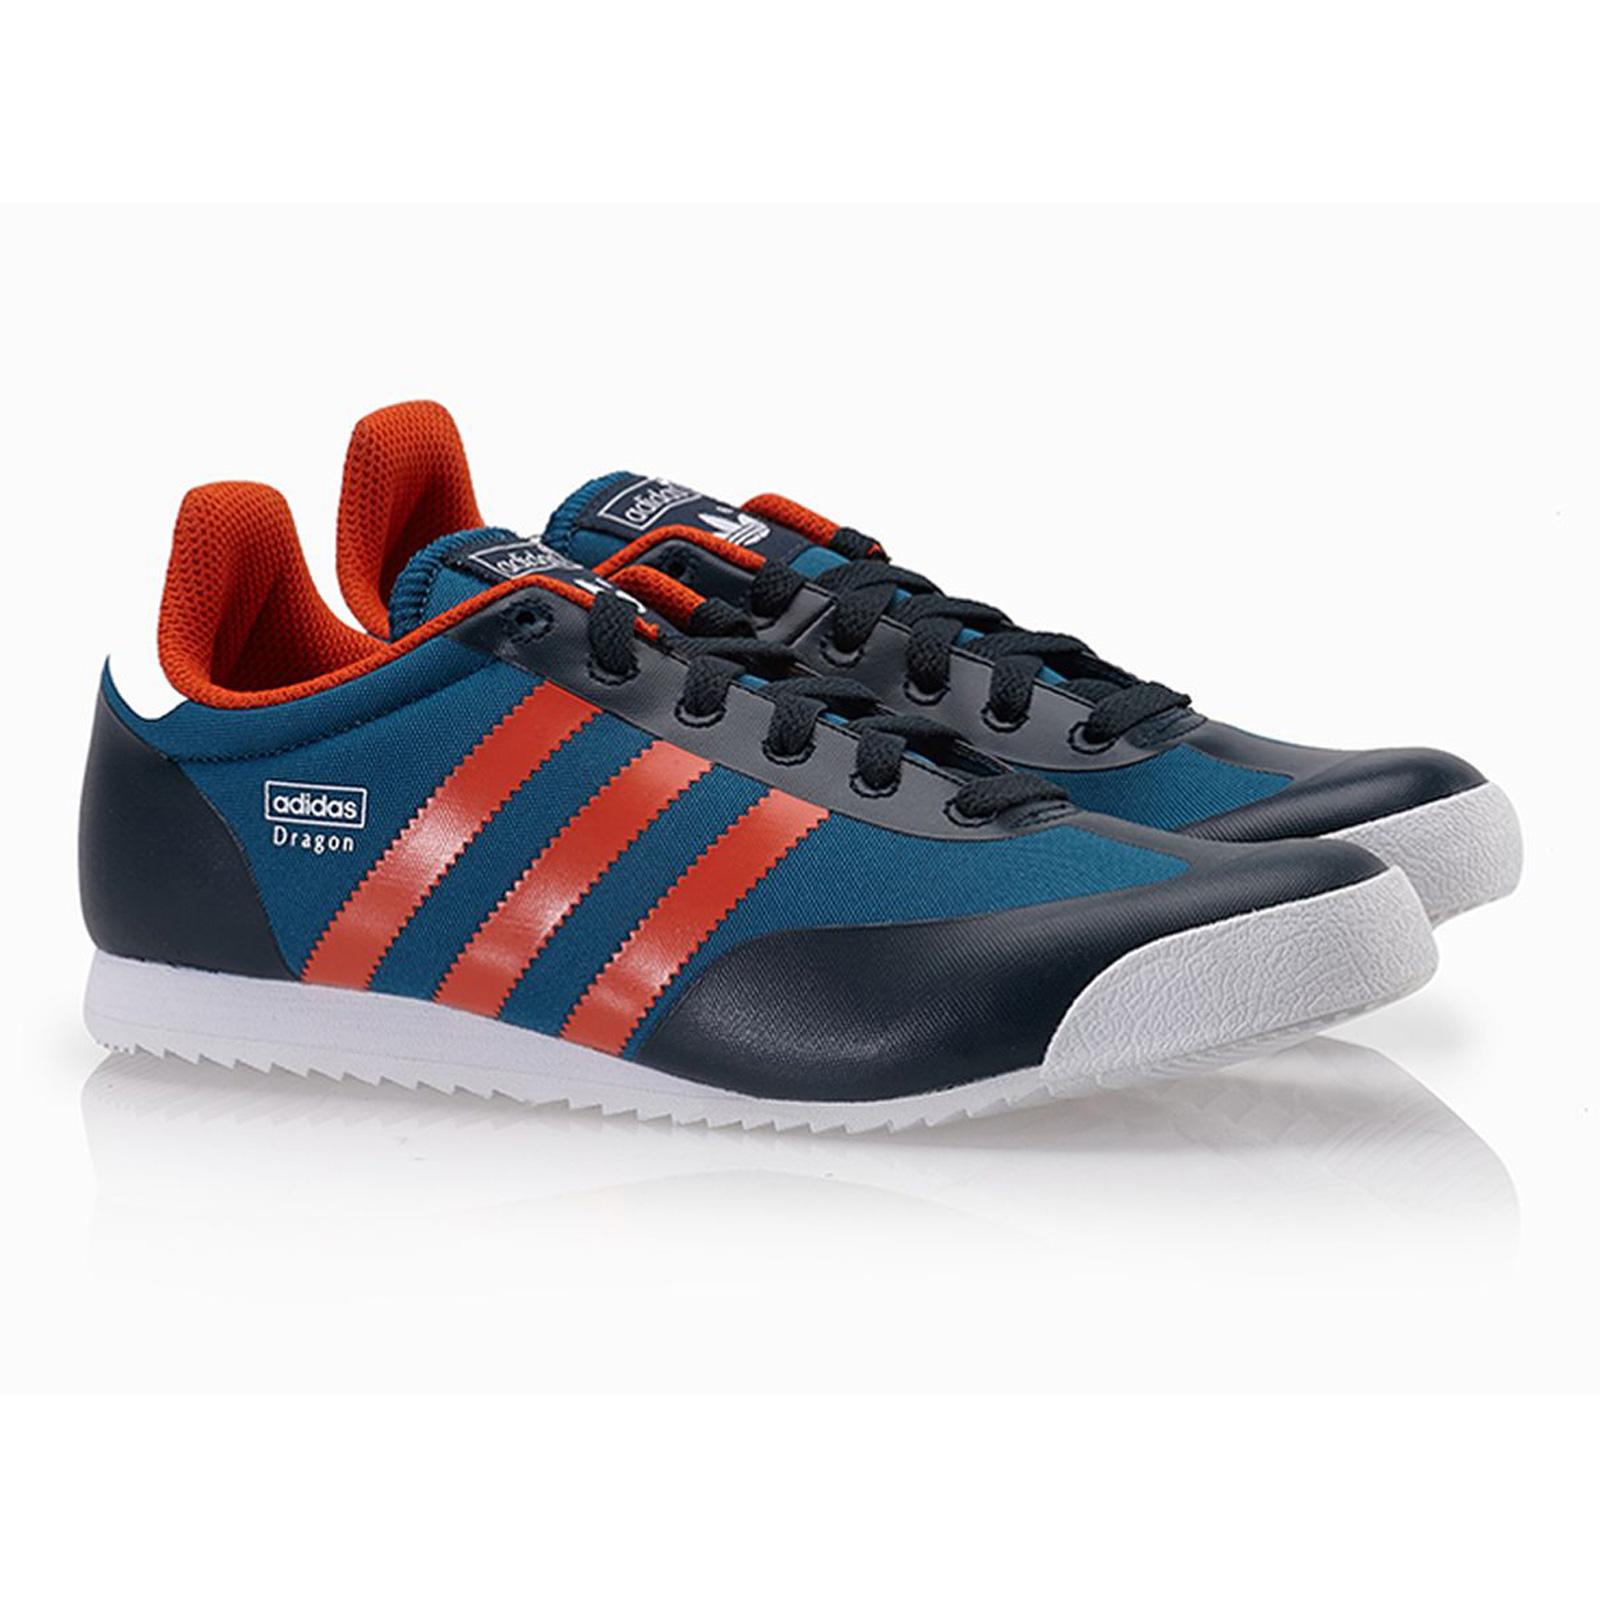 buy popular 2d0f9 566fb adidas Originals Dragon Damen Schuhe Freizeit Sneaker M17095 Blau Petrolink